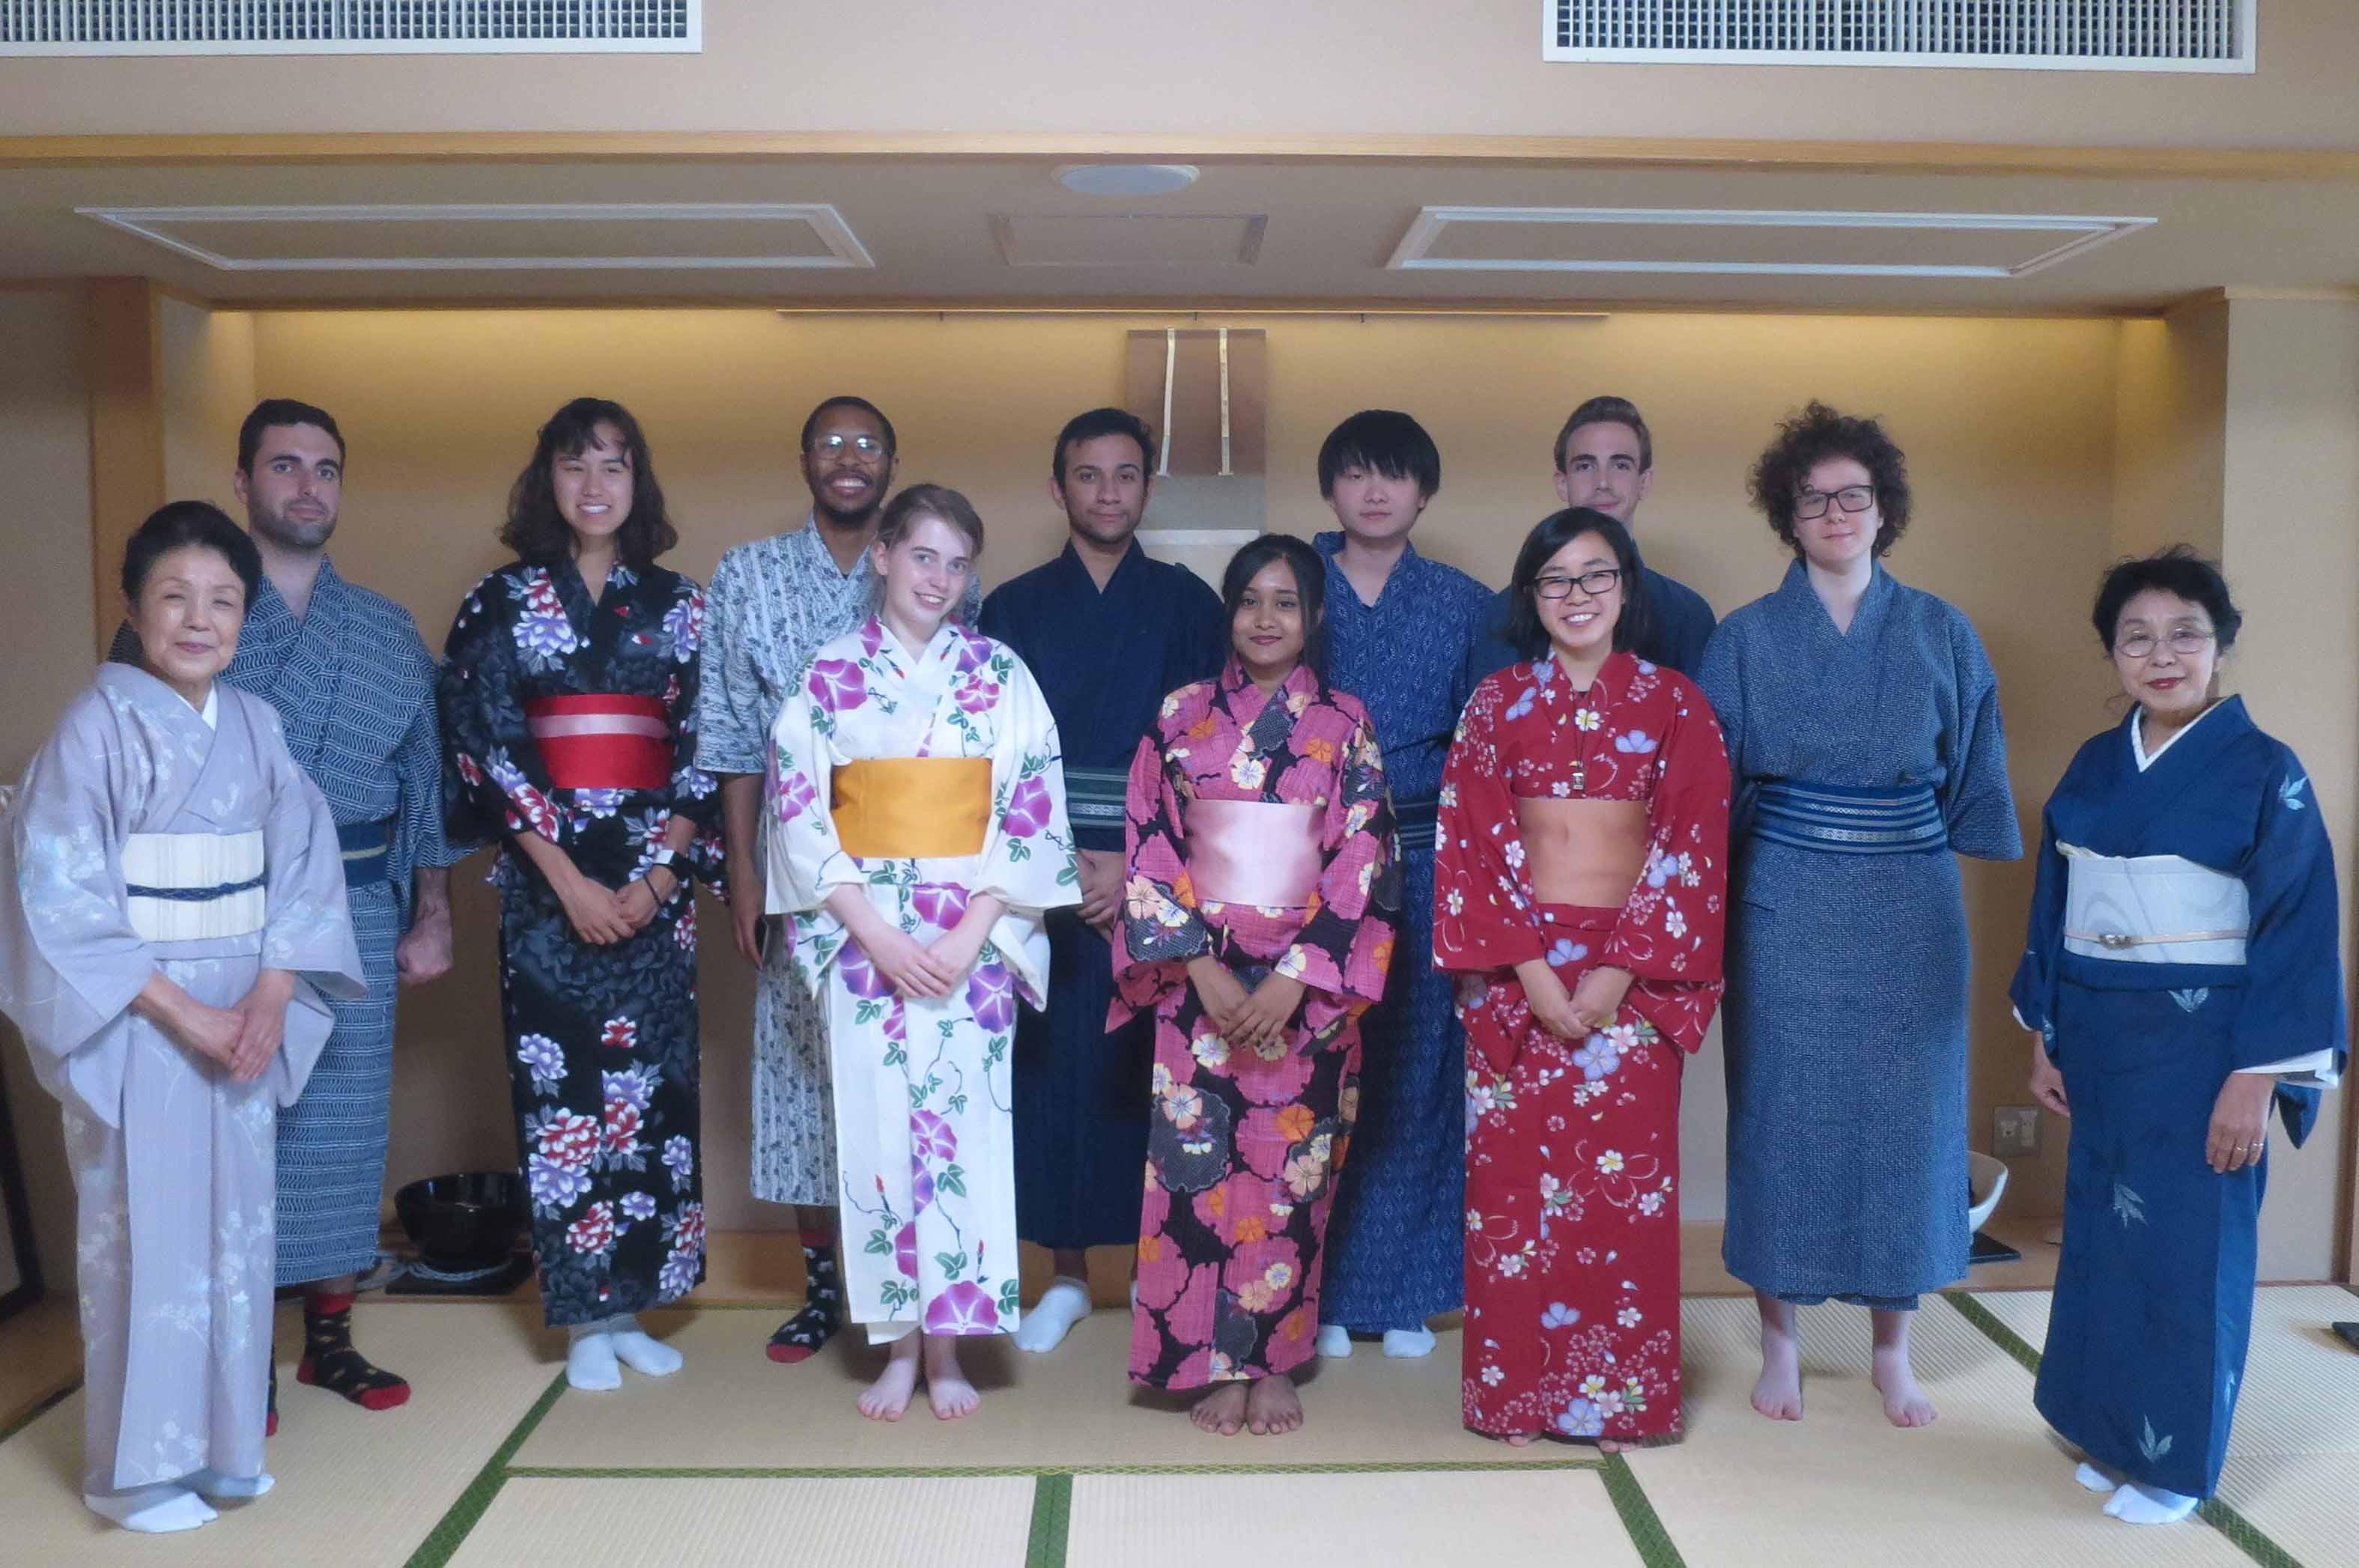 Picture of Kimono-wearing